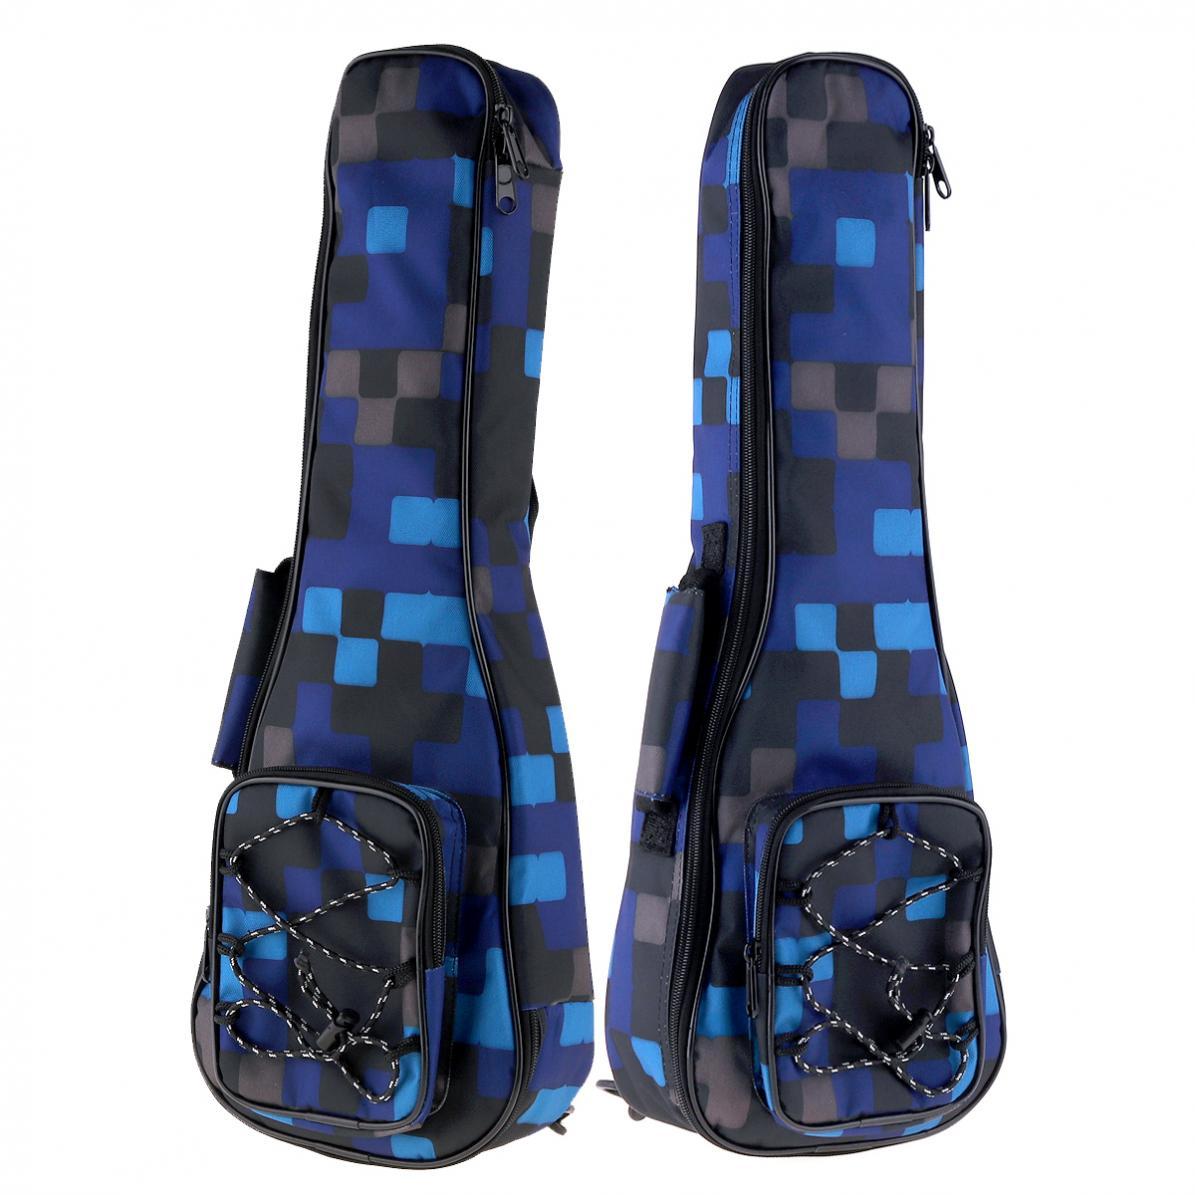 21 Inch Colorful Ukulele Bag 10mm Cotton Soft Case Gig Ukulele Mini Guitar Backpack 2 Colors Optional enlarge